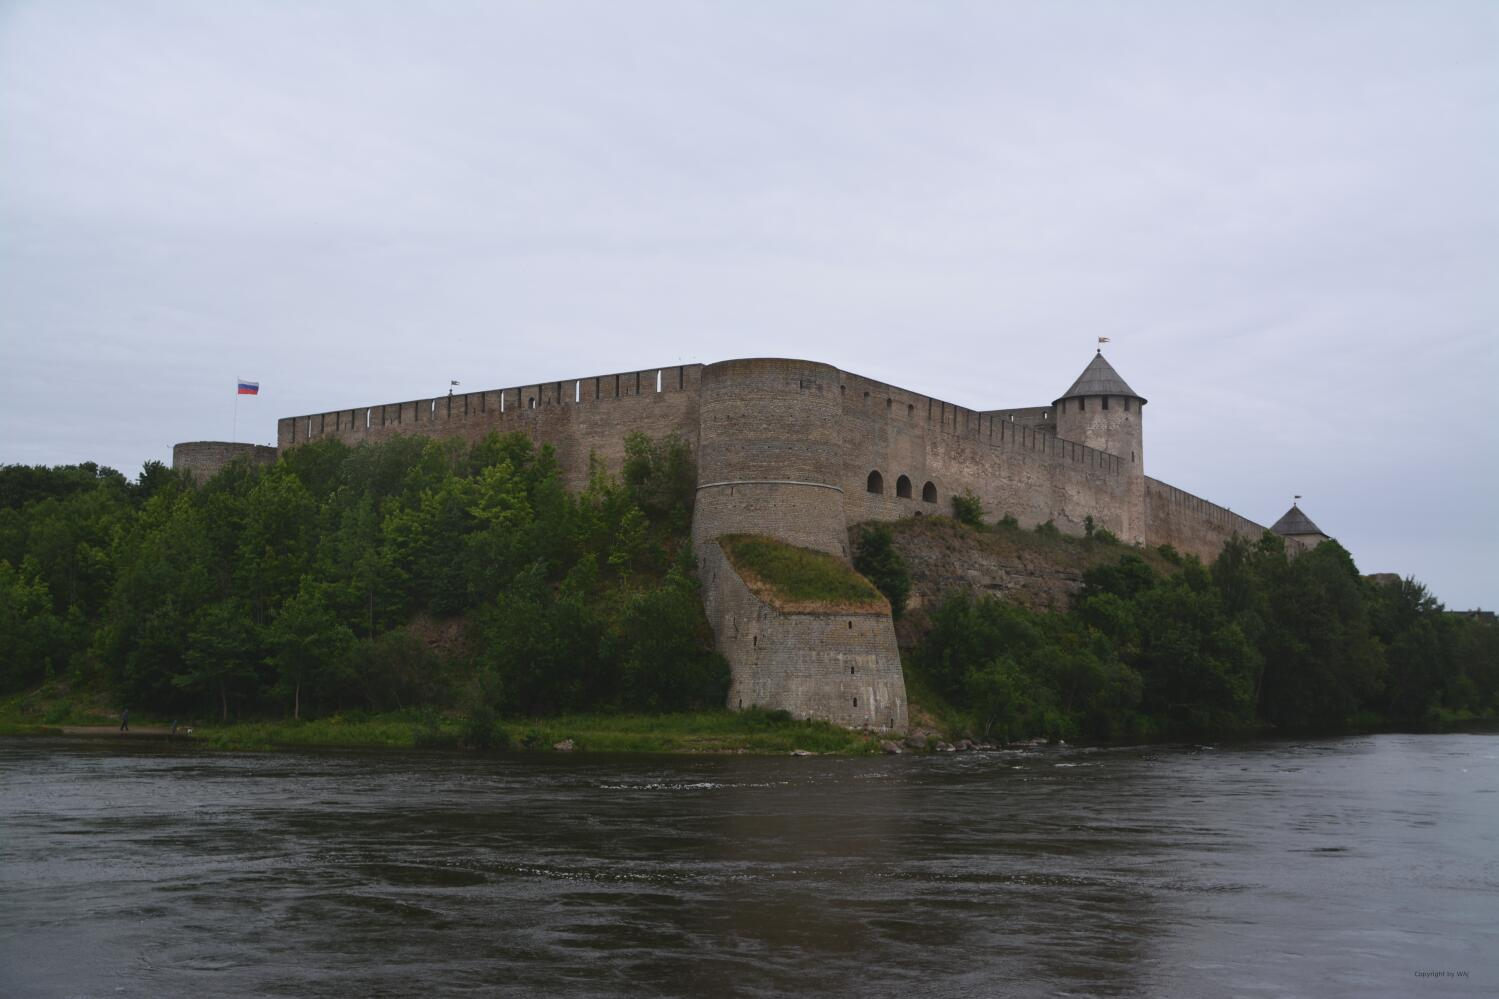 Festung Ivangorod